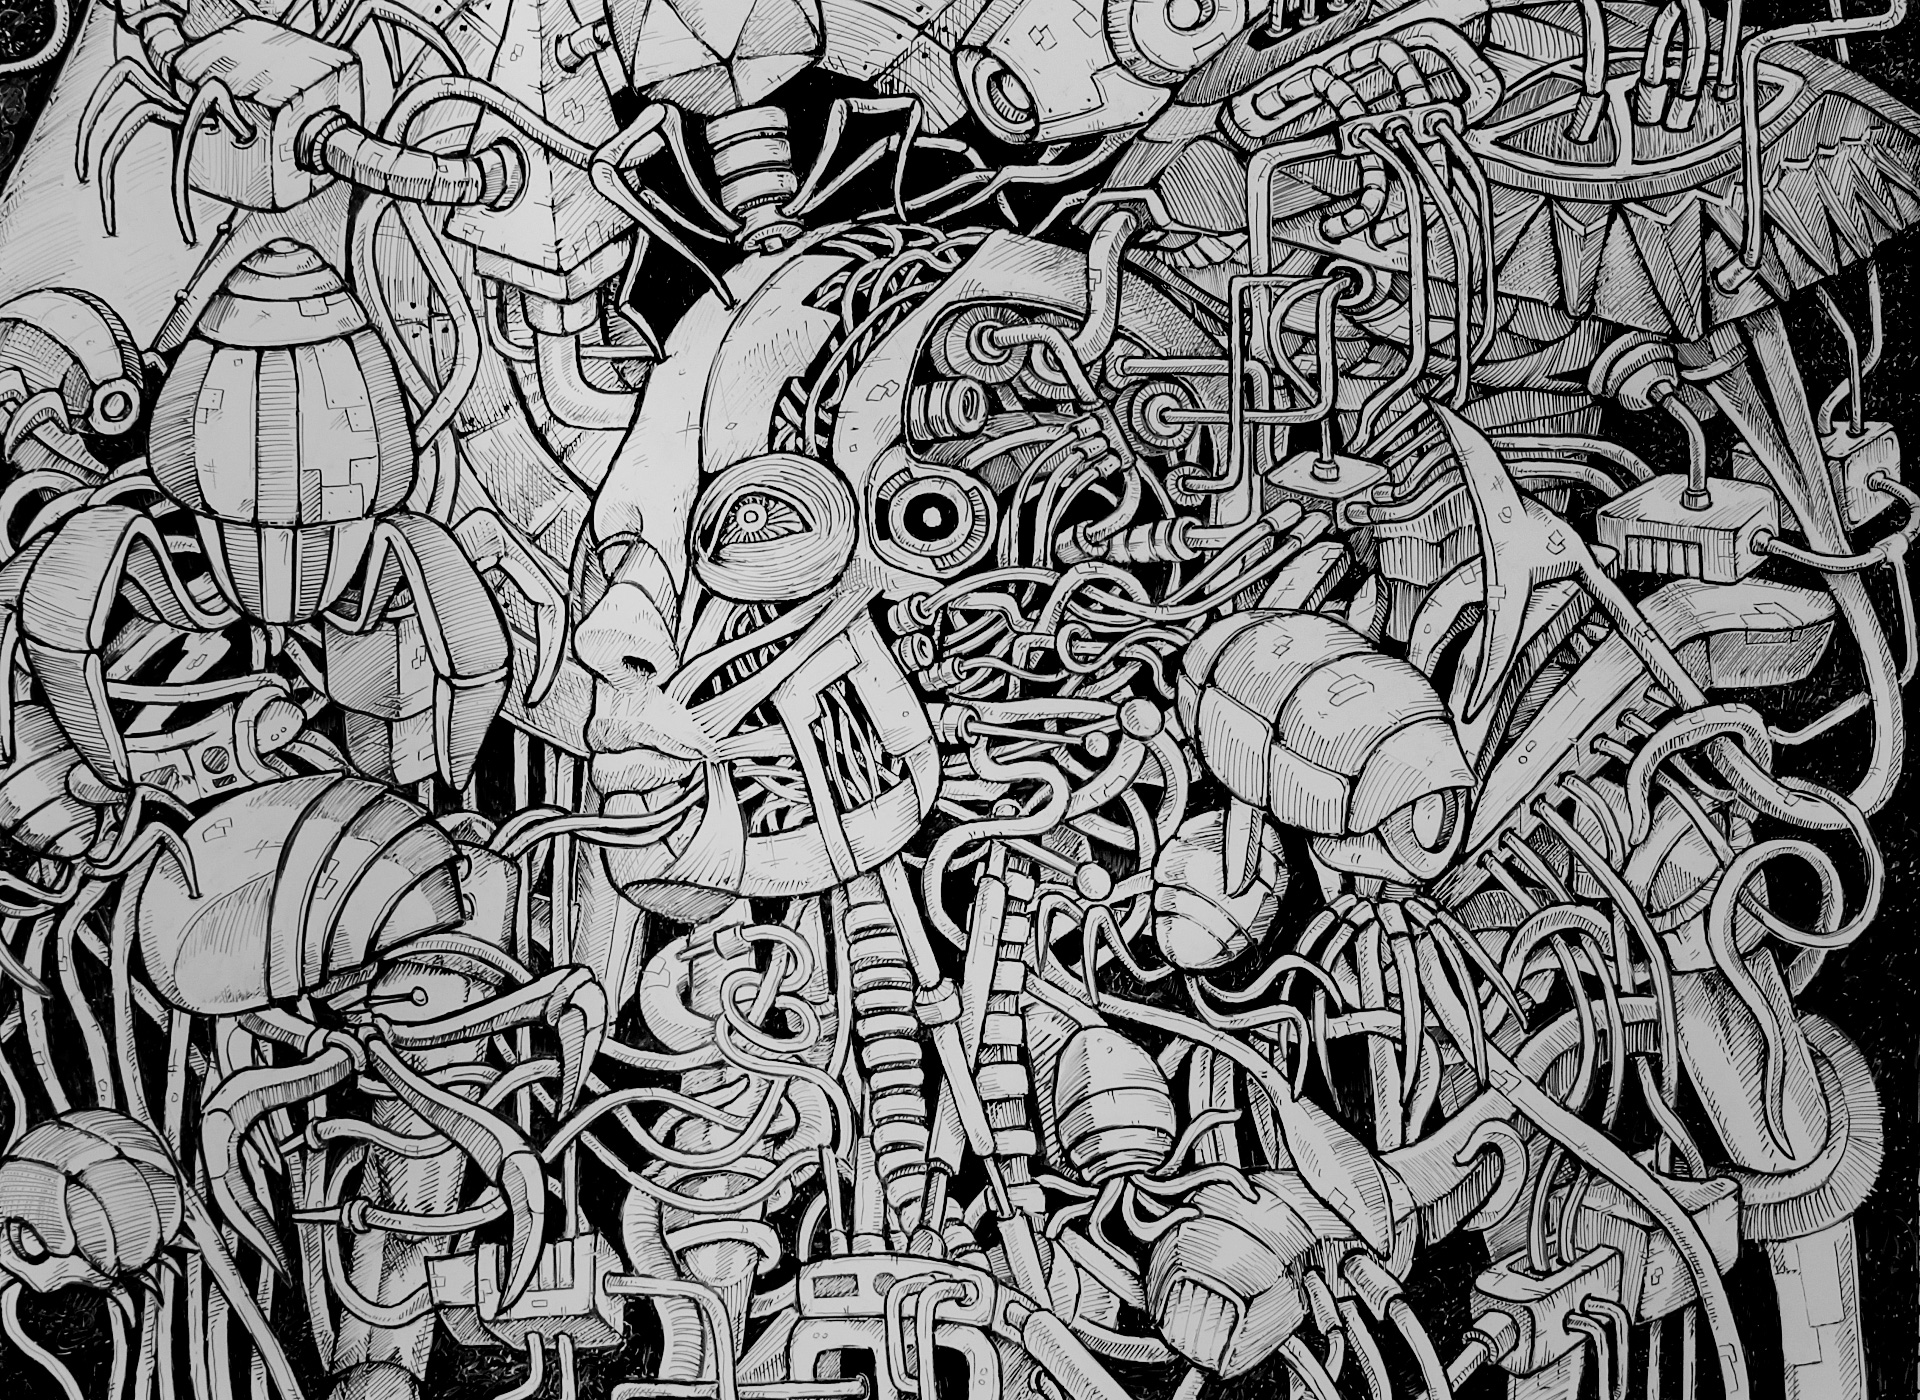 doodles10.jpg